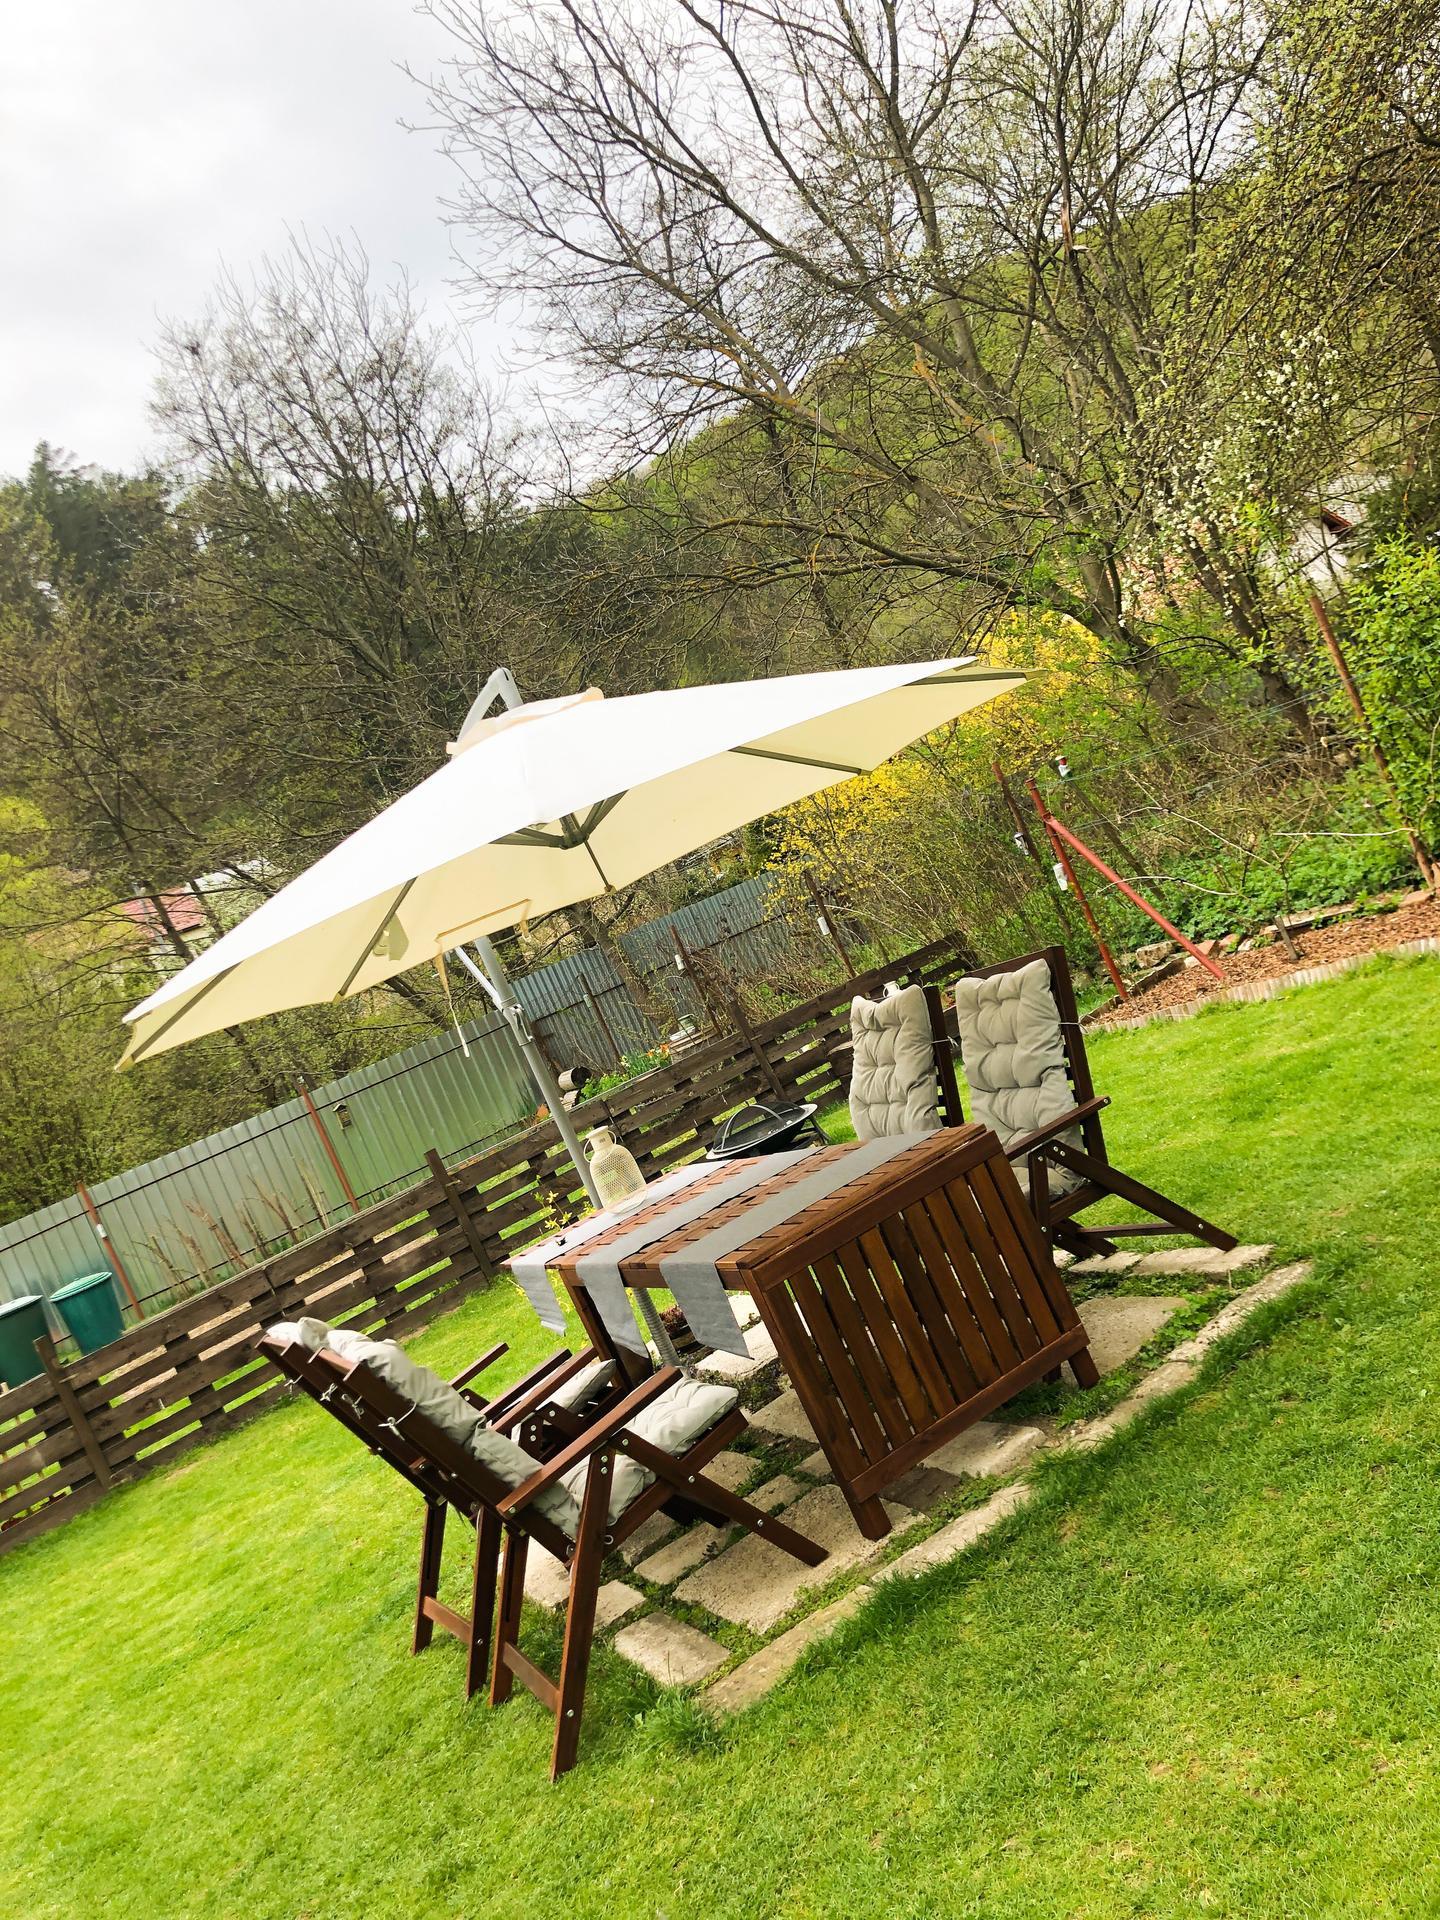 Zahrada a upravy okolo domu - novy zahradny Ikea Setup